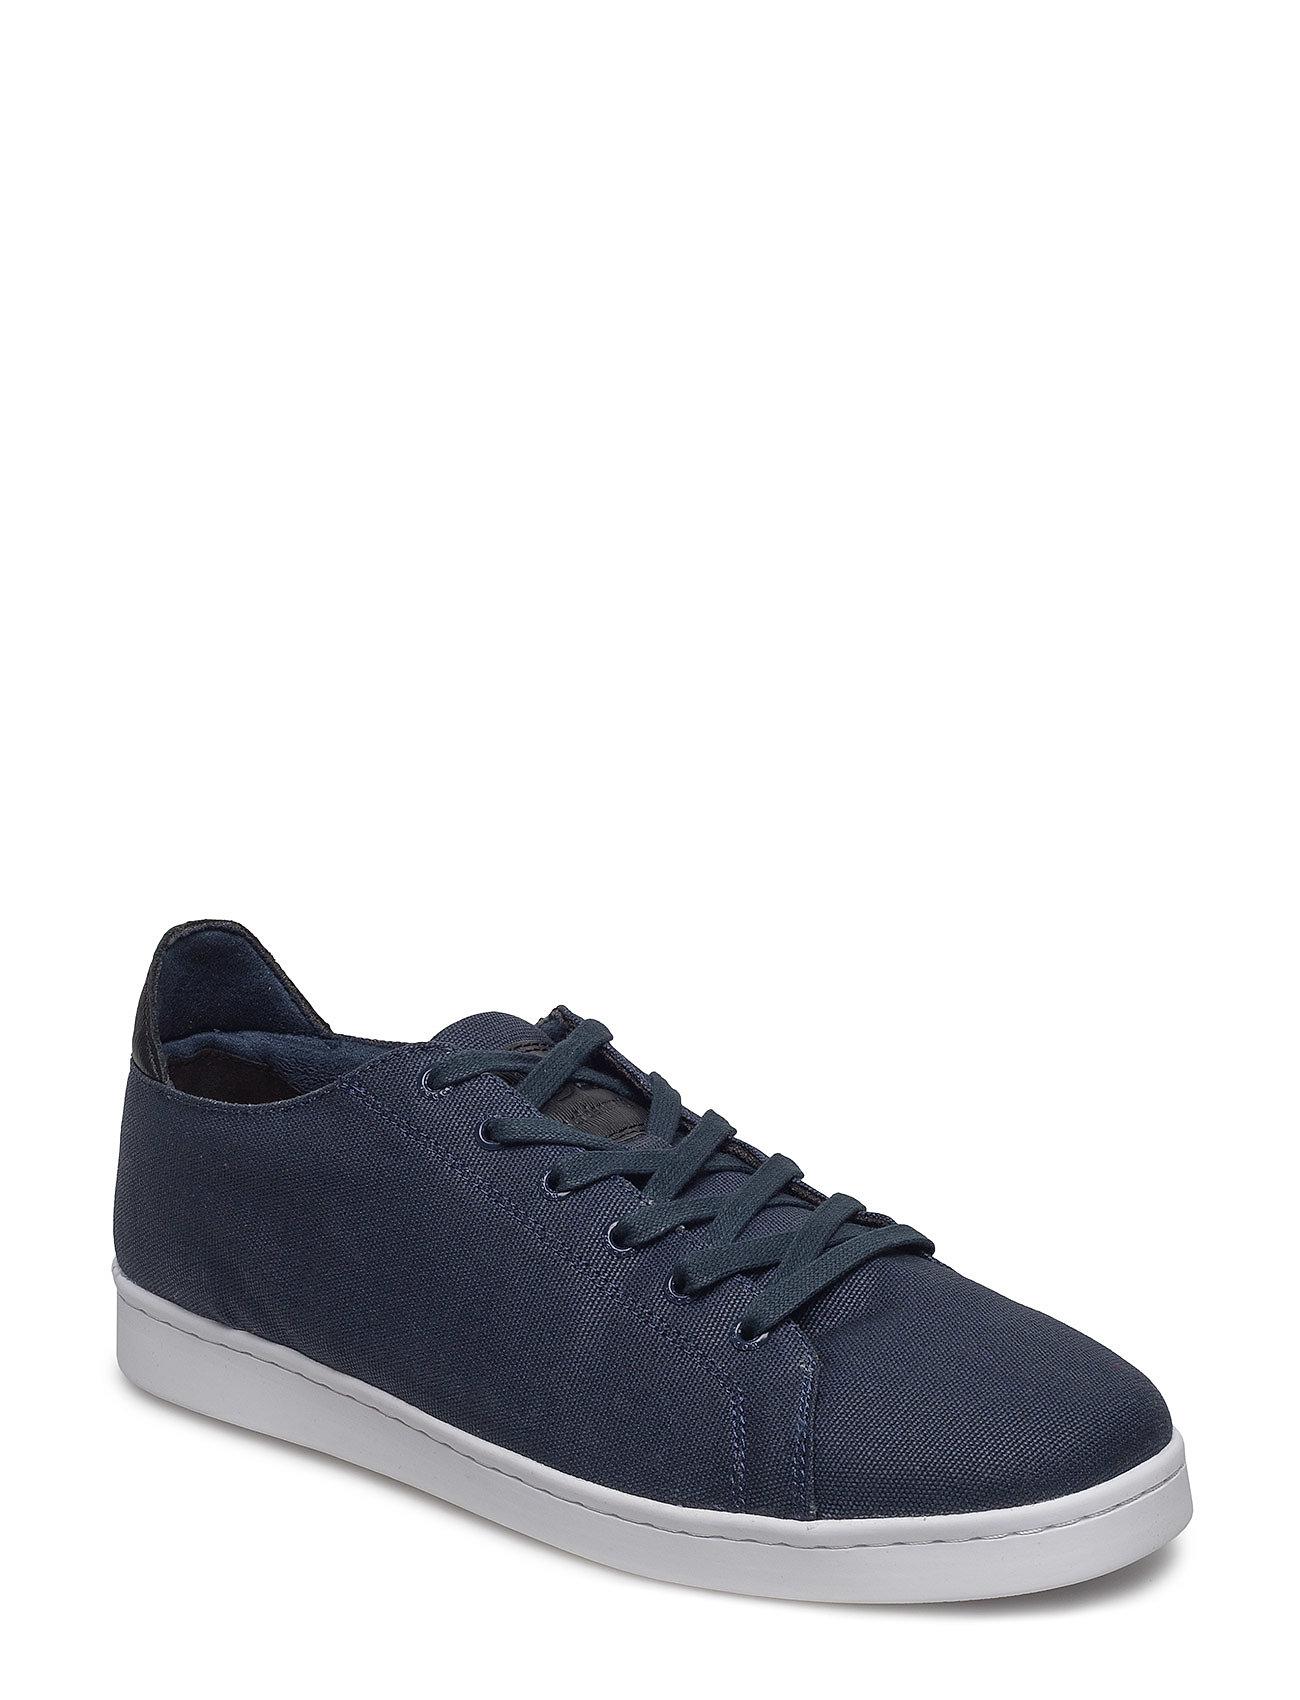 Balder Canvas Iii Woden Casual sko til Herrer i Navy blå